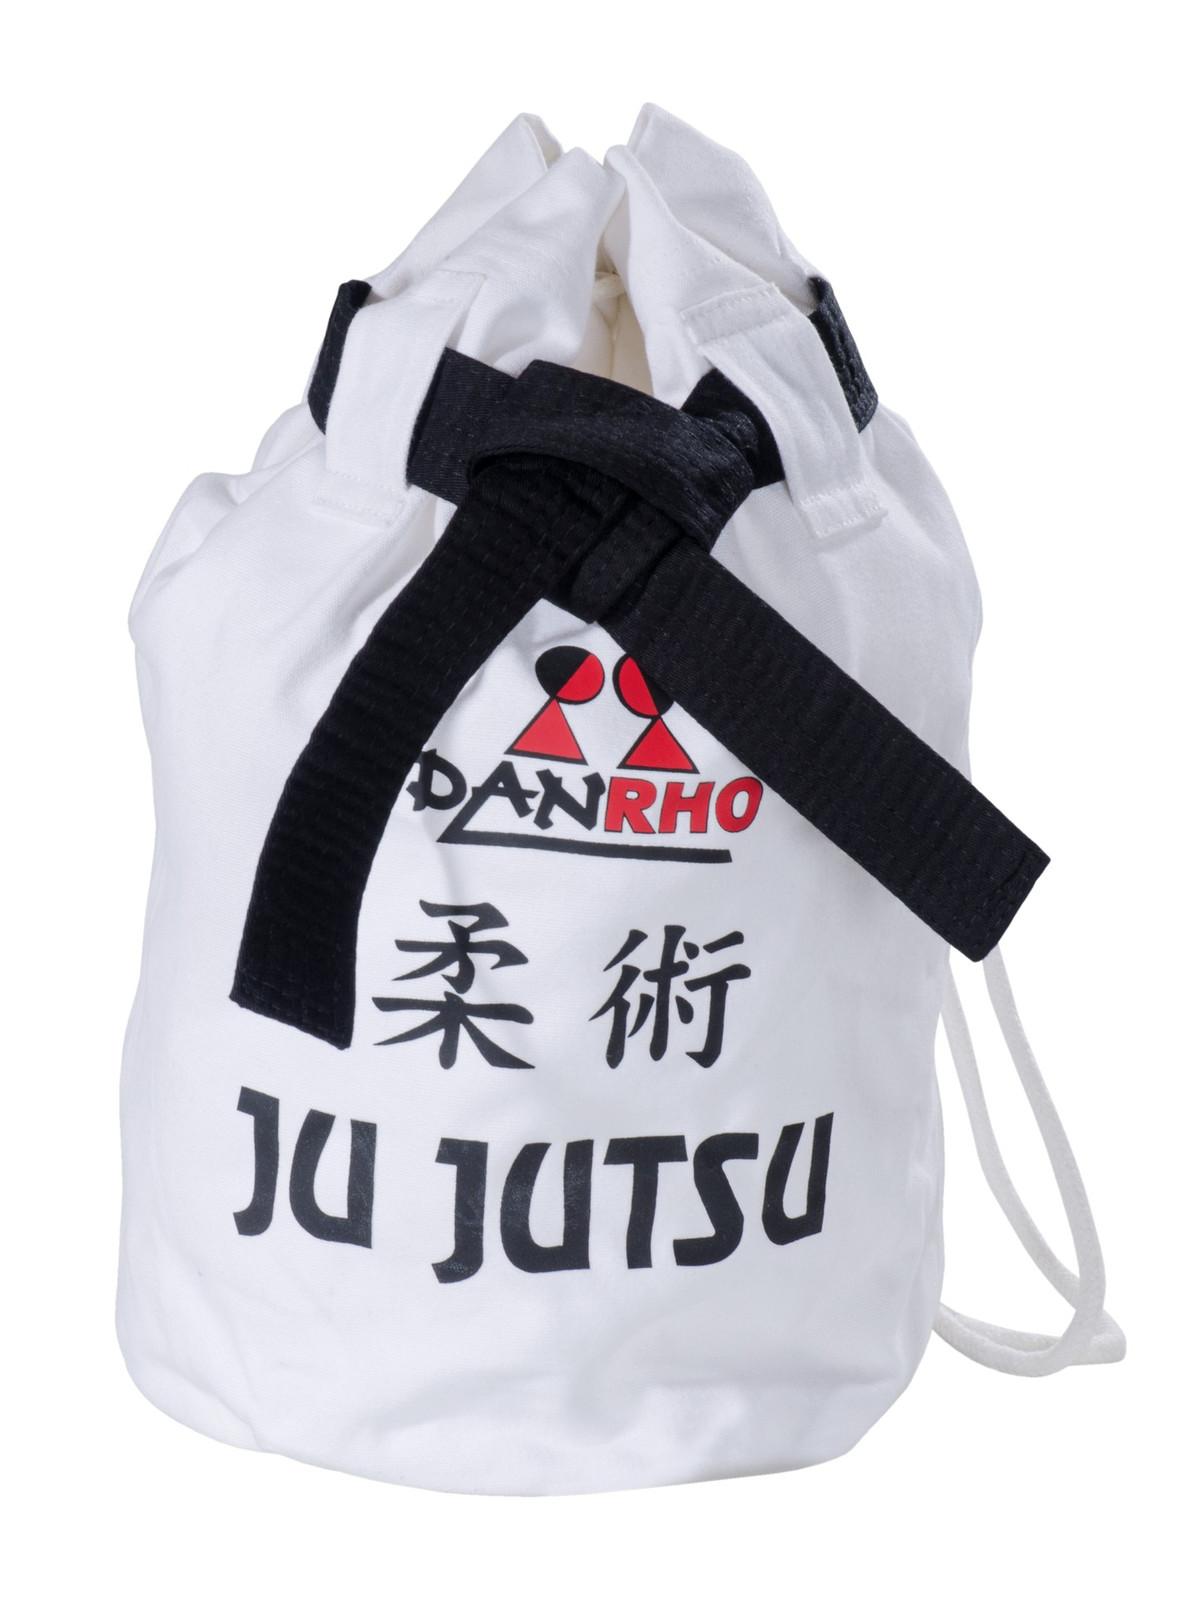 DanRho Dojoline Canvas Tasche